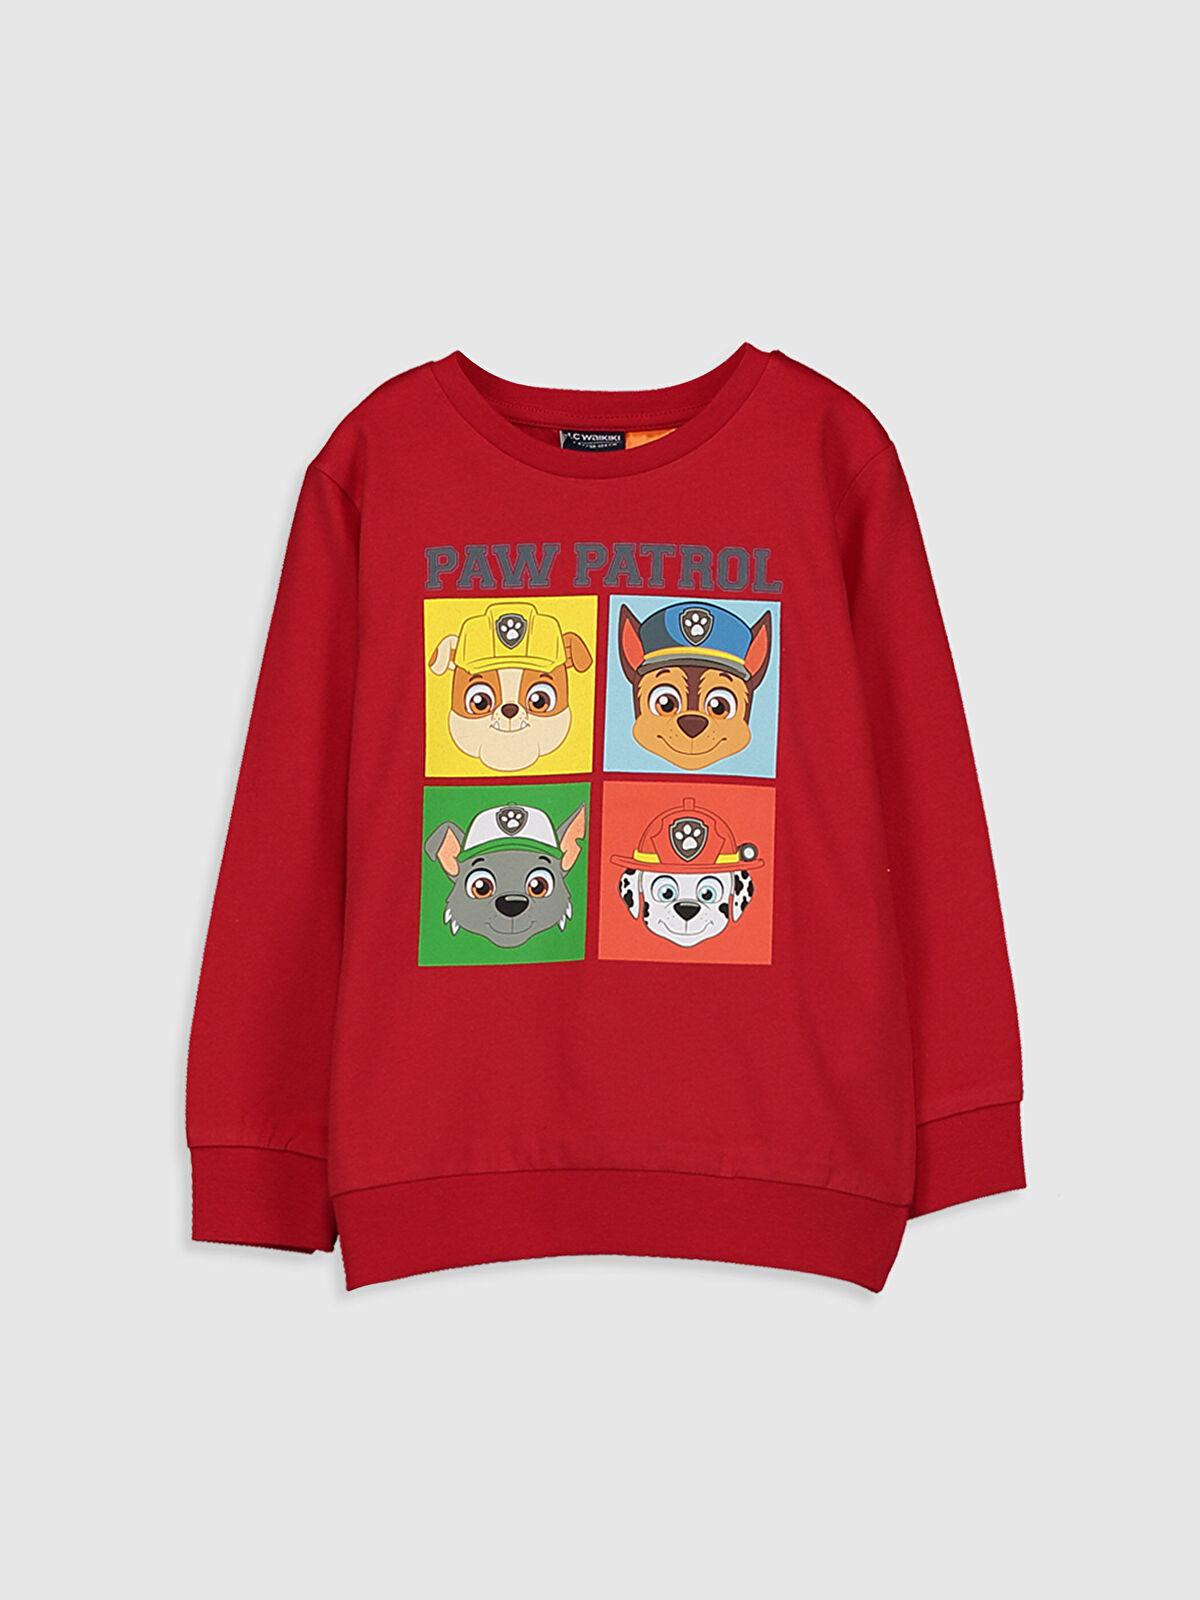 Erkek Çocuk Paw Patrol Baskılı Pamuklu Tişört - LC WAIKIKI